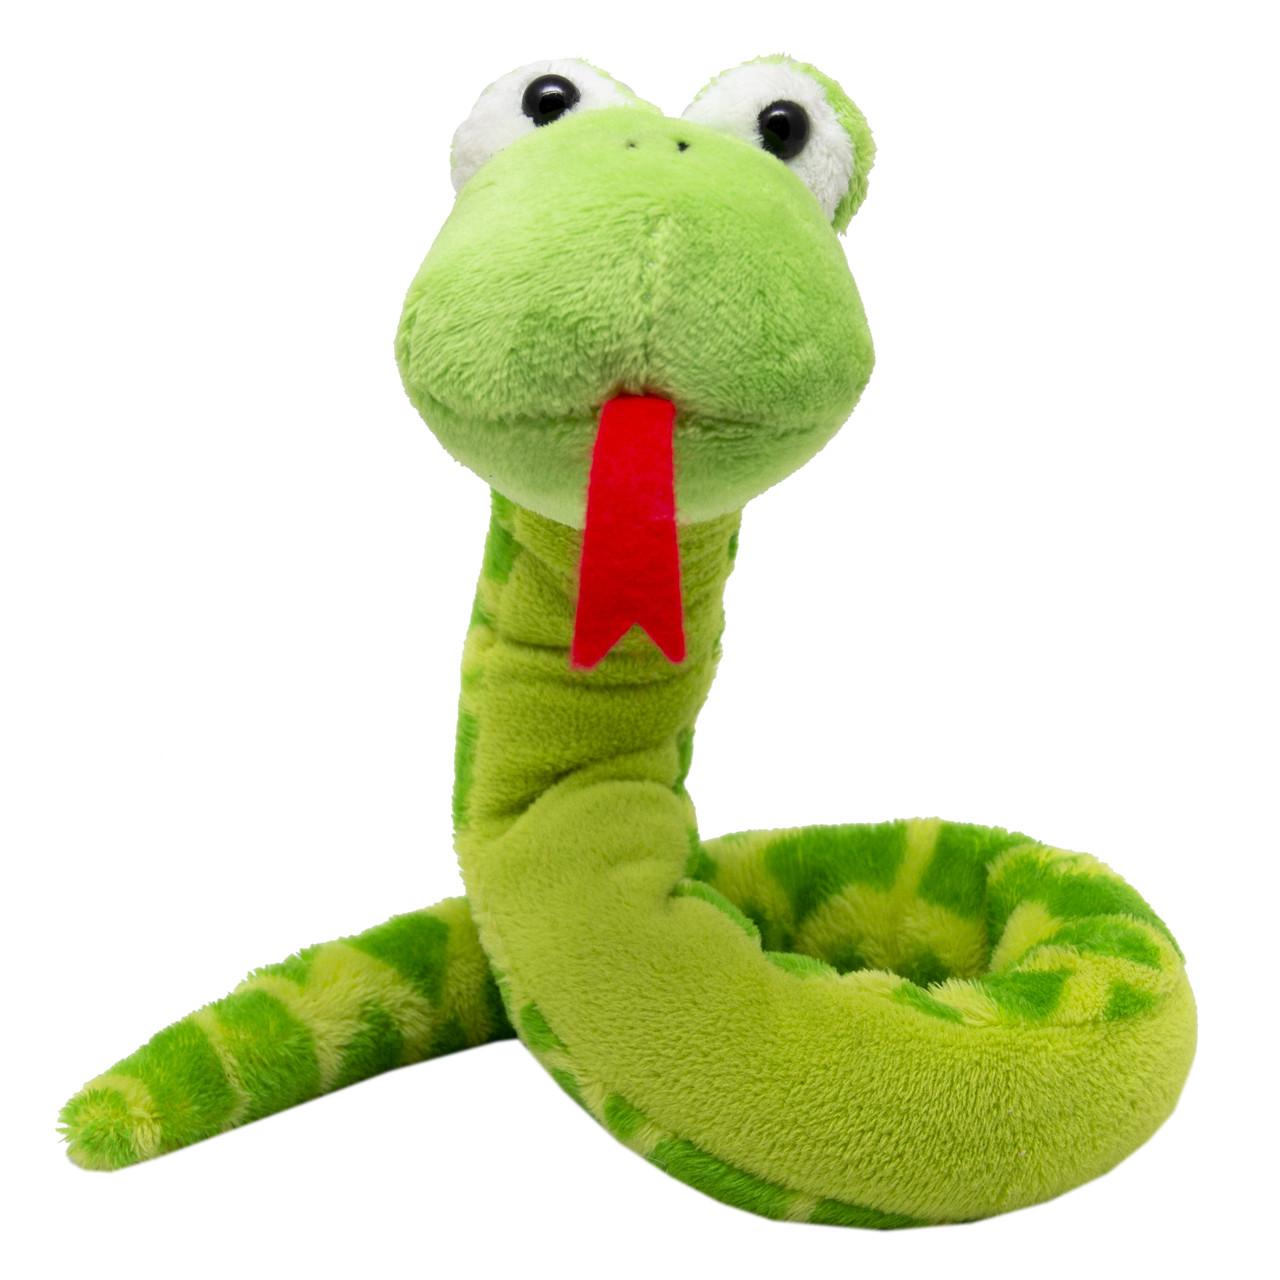 Мягкая игрушка Змея зеленая, 53 см (M1128753A-1)